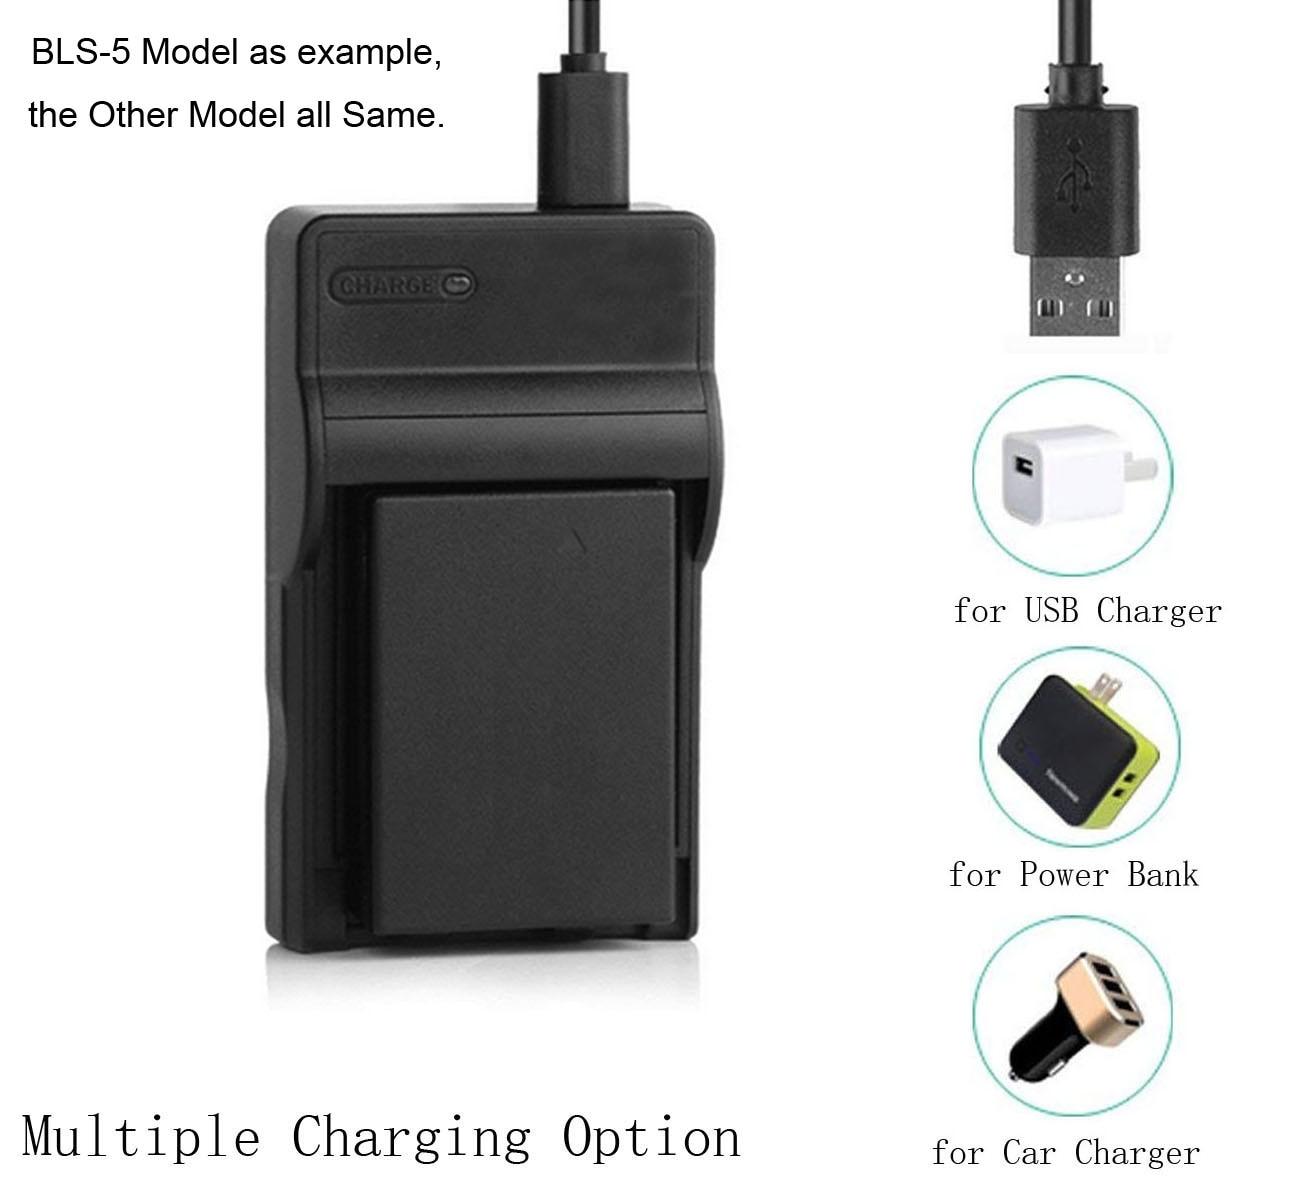 VP-D590Ri VP-D6050i VP-D530Ti Battery Pack VP-D6040i Digital Video Camcorder Charger for Samsung VP-D530i VP-D590i VP-D590Ti